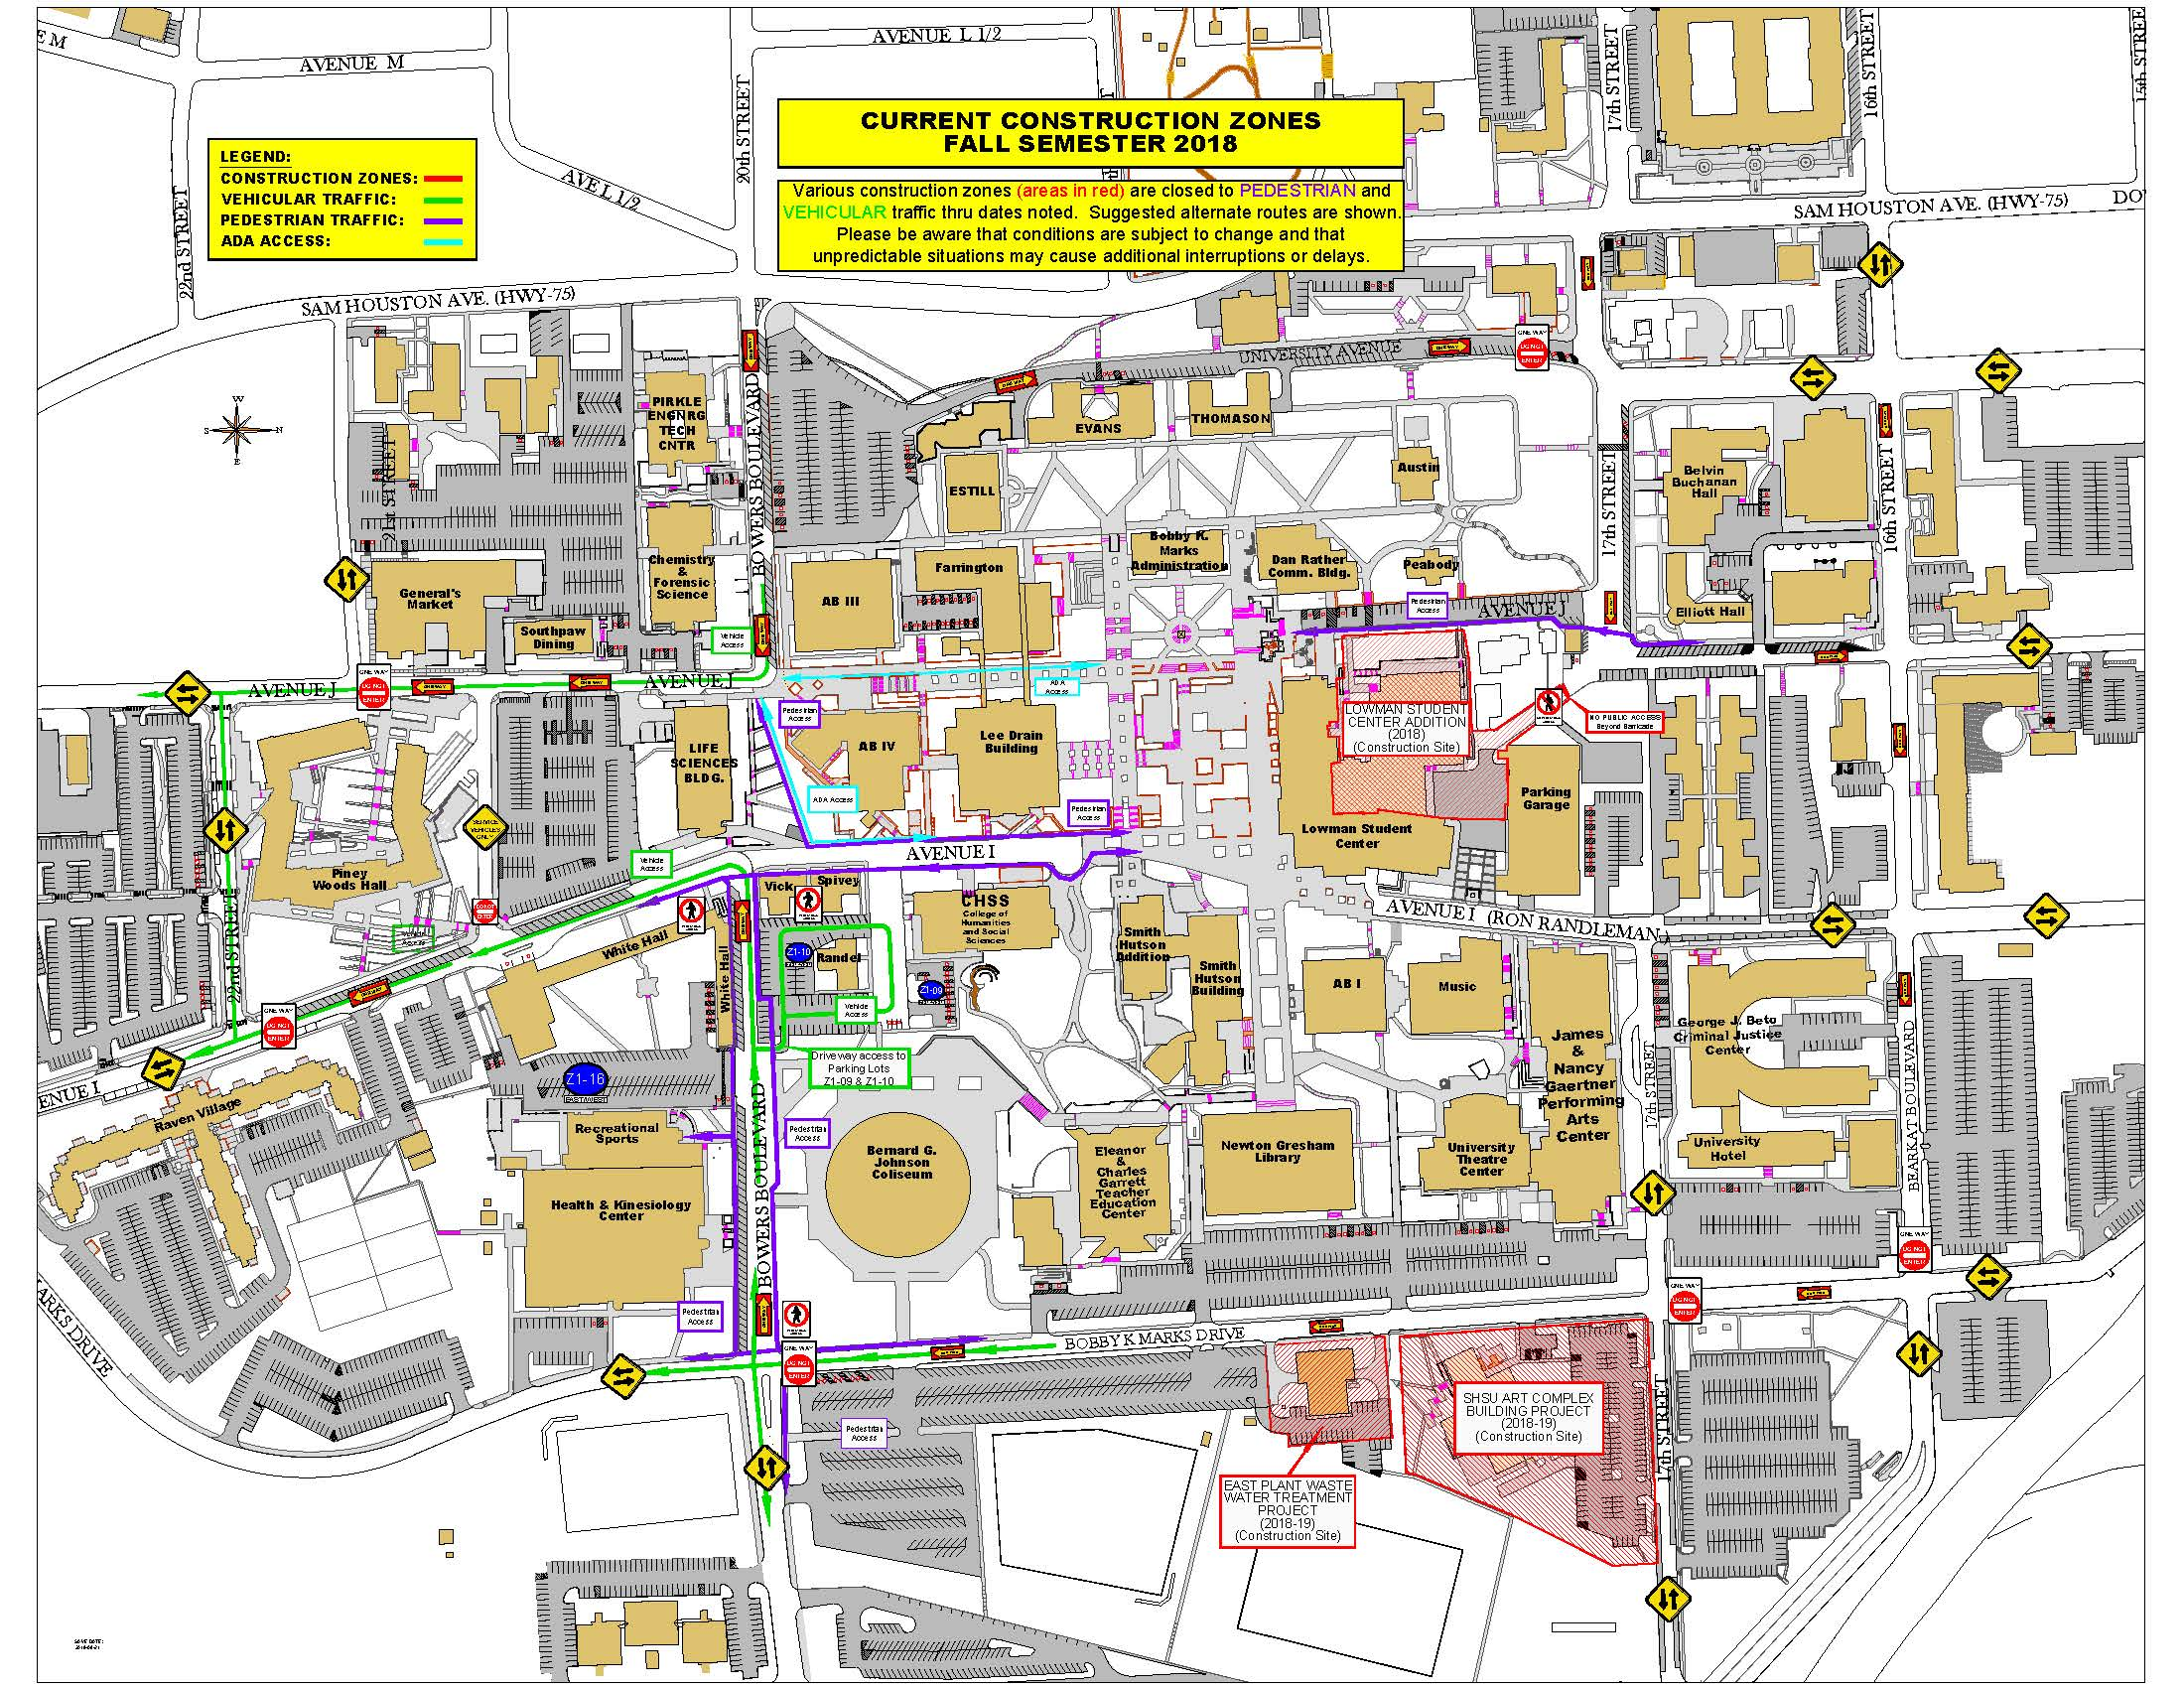 Facilities Management - Sam Houston State University